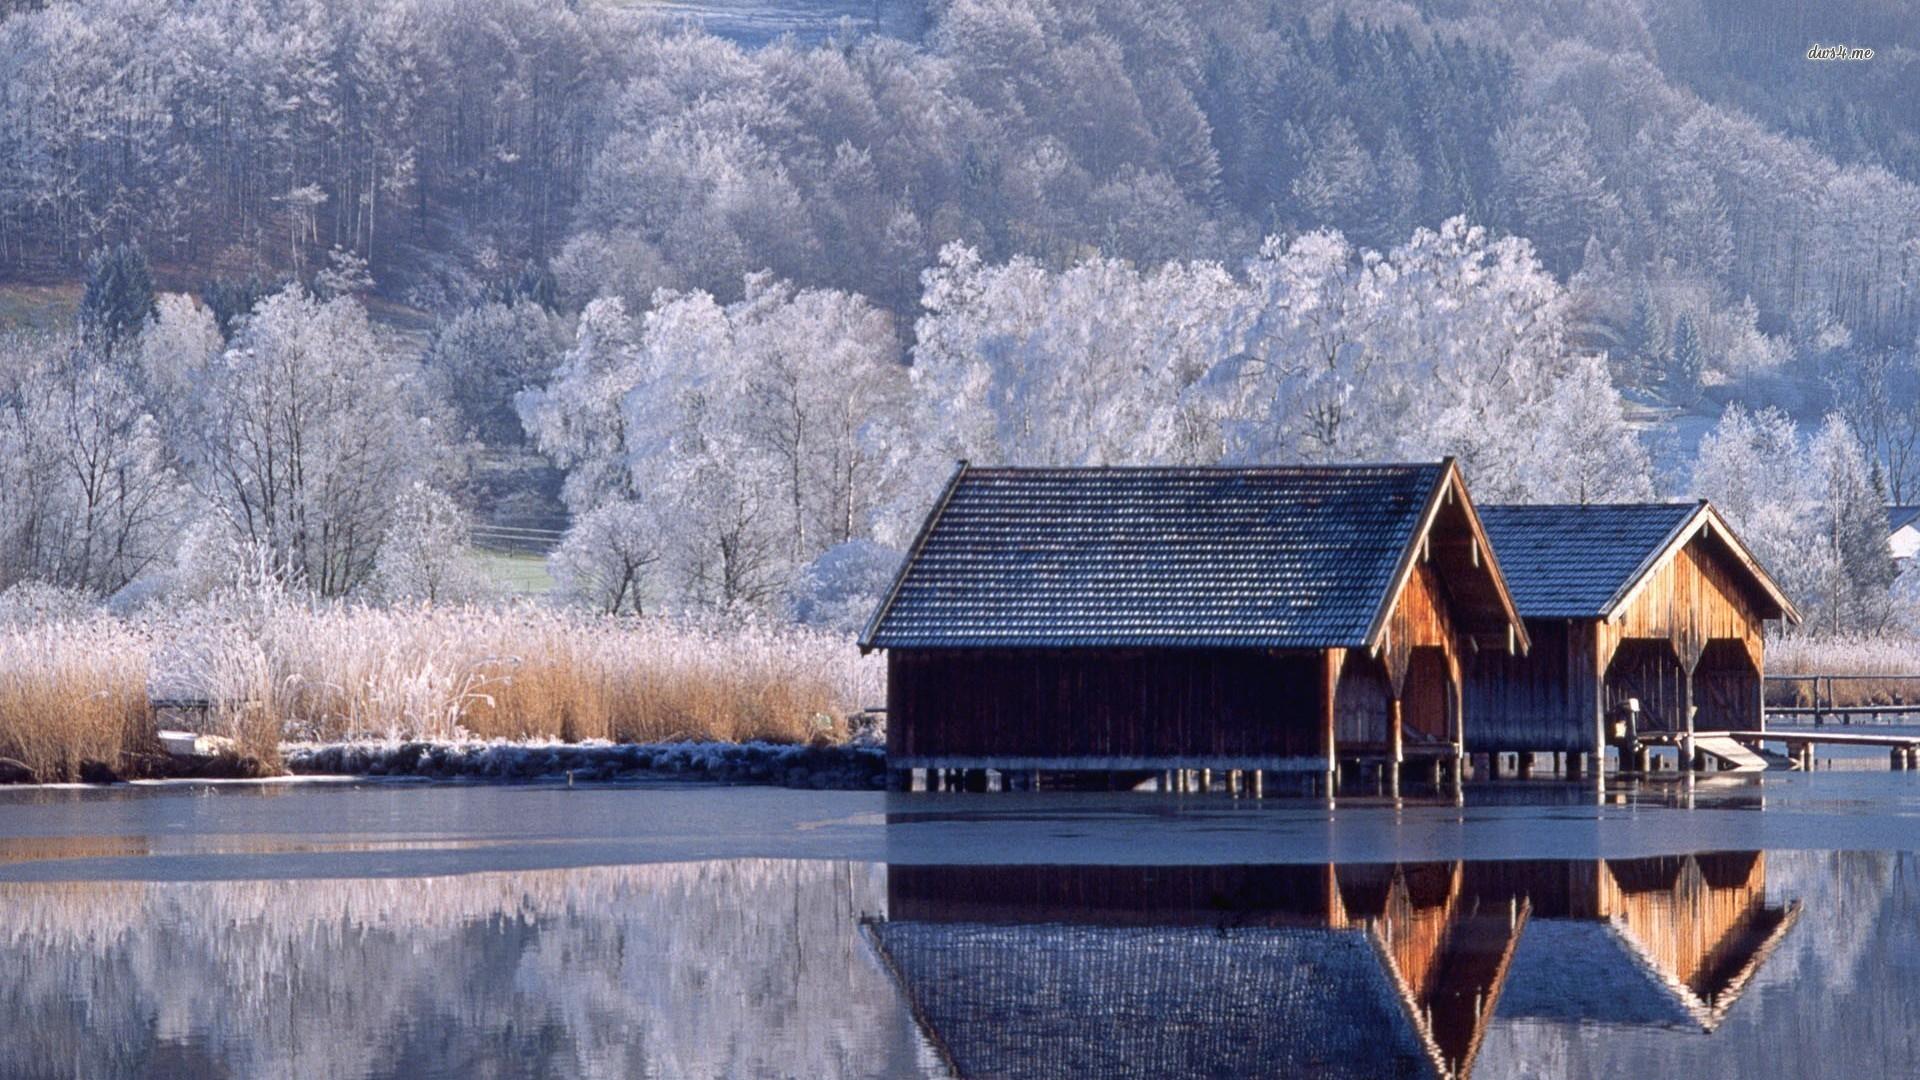 Winter Scenery Live Wallpaper Download – Winter Scenery Live   Adorable  Wallpapers   Pinterest   Live wallpapers, Winter scenery and Snow scenes